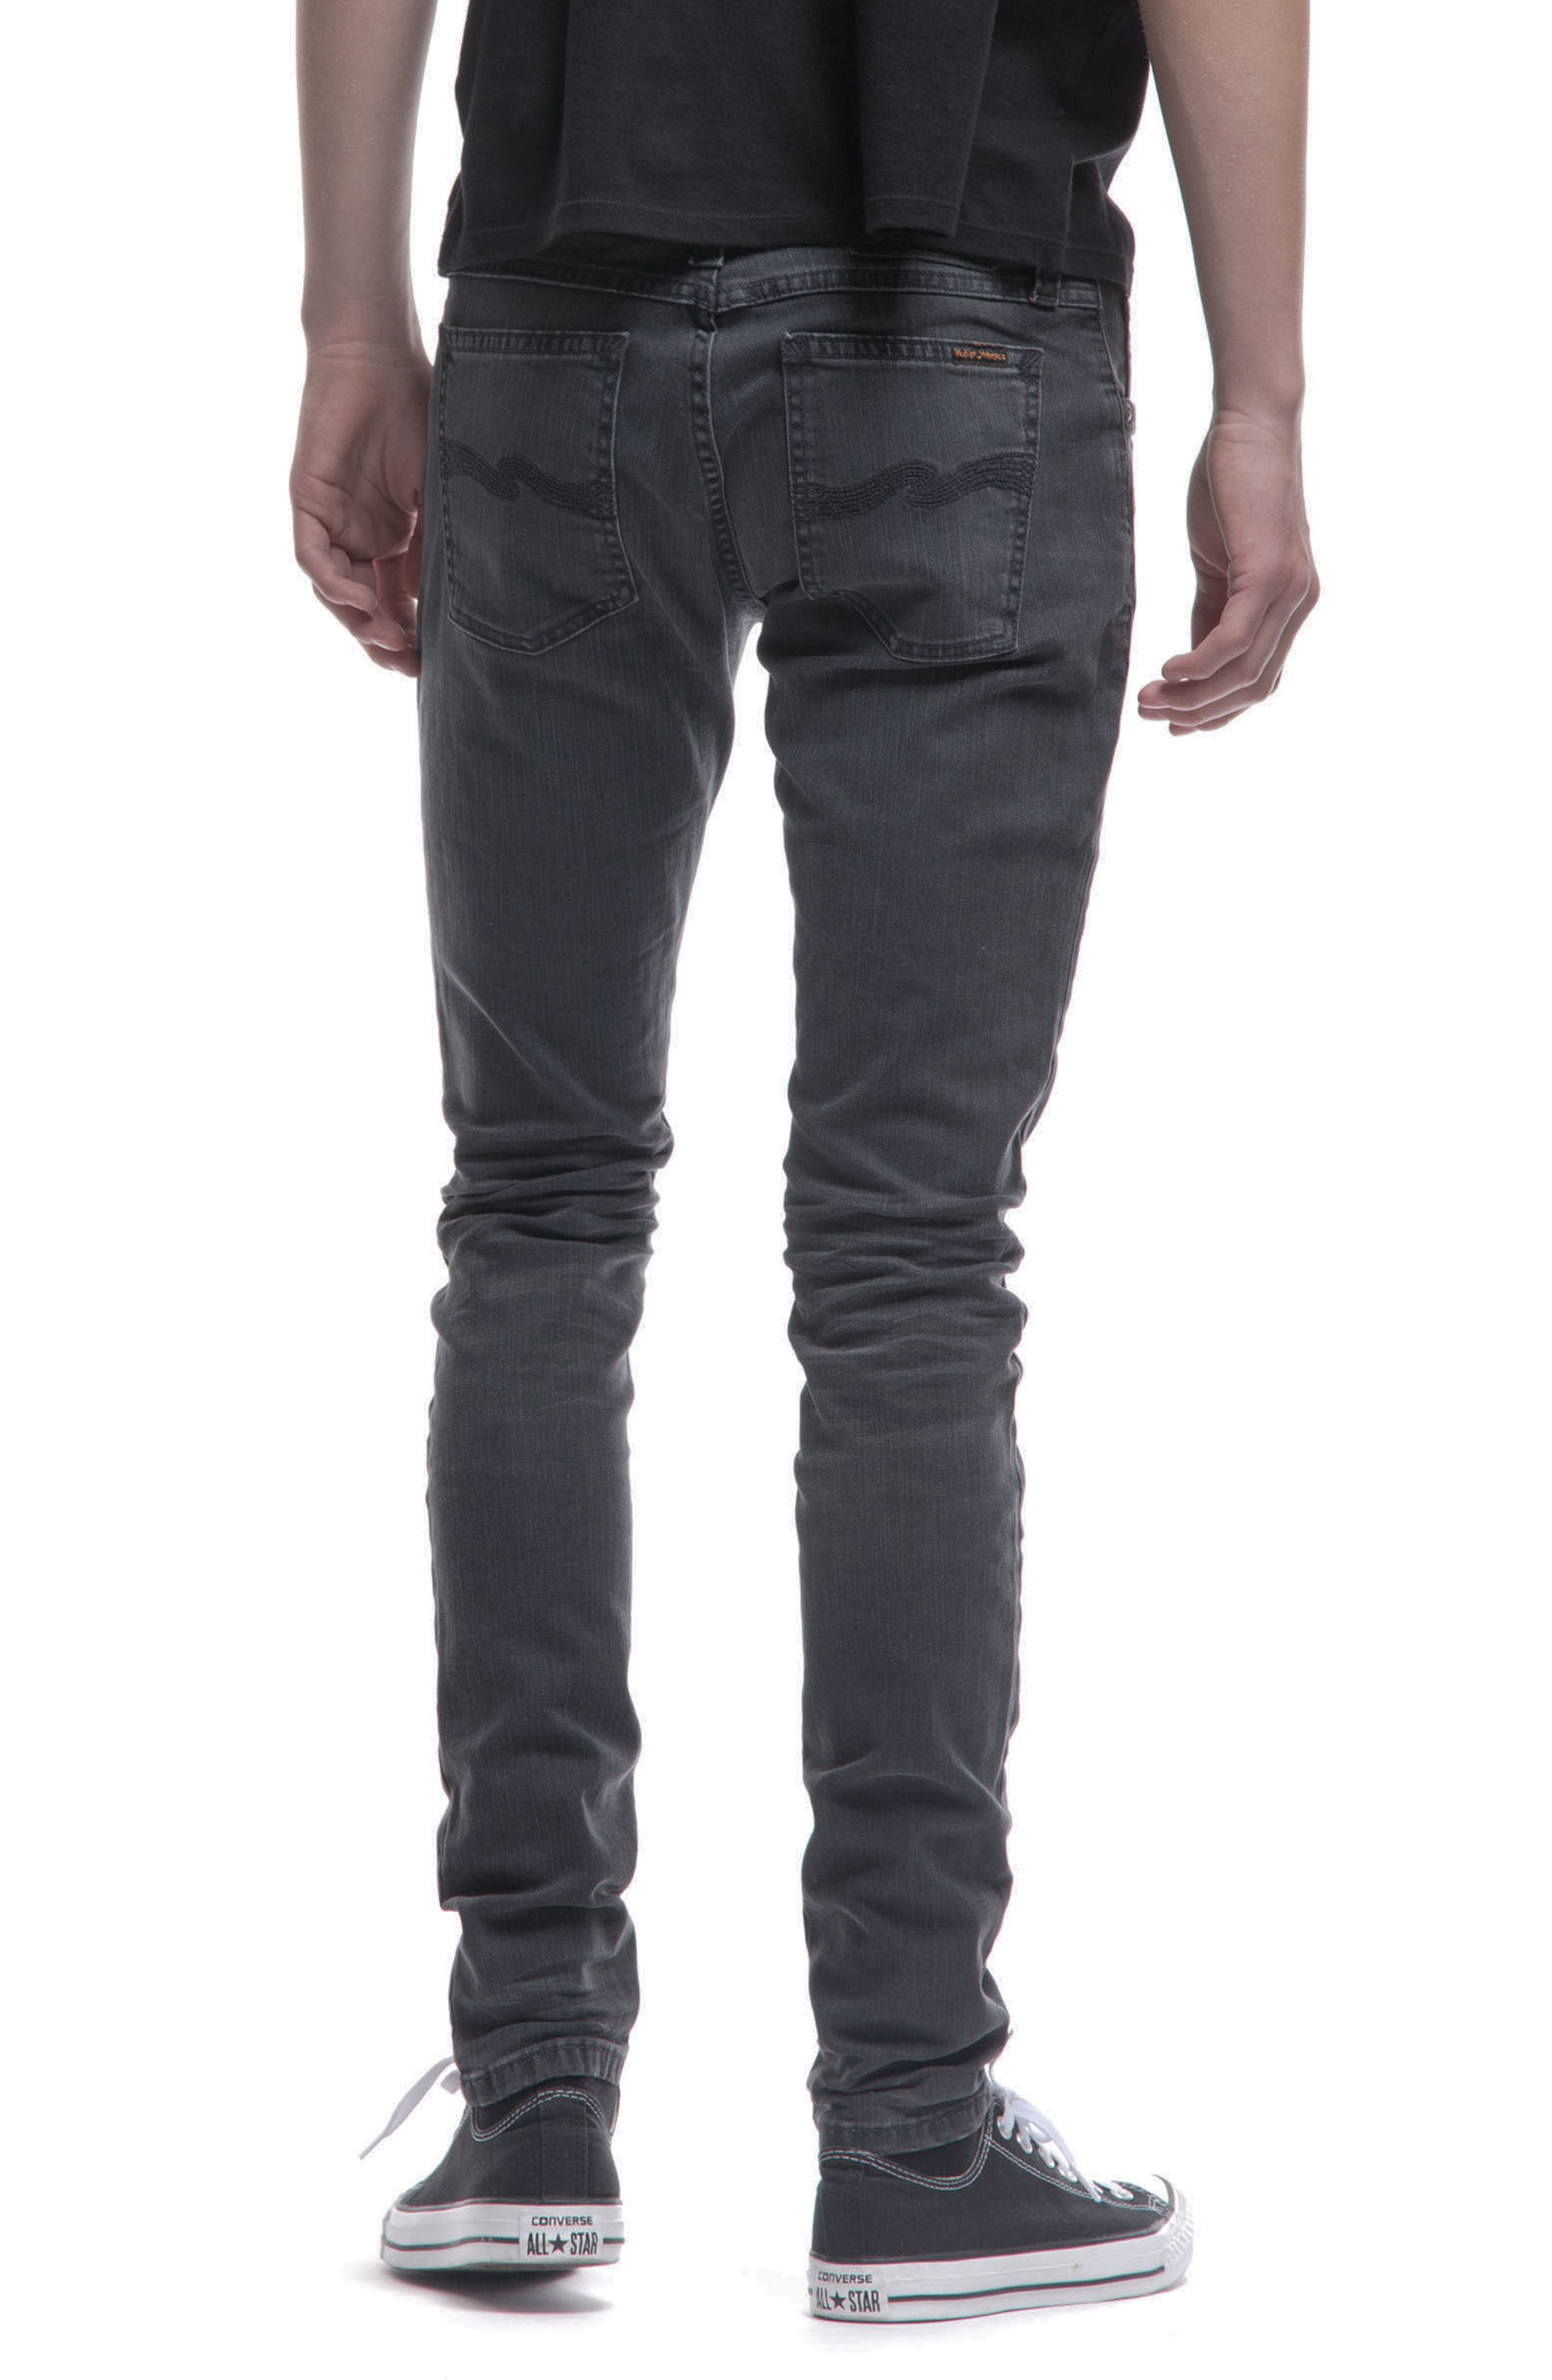 Skinny Lin Skinny Fit Jeans,                             Alternate thumbnail 2, color,                             Black Seas